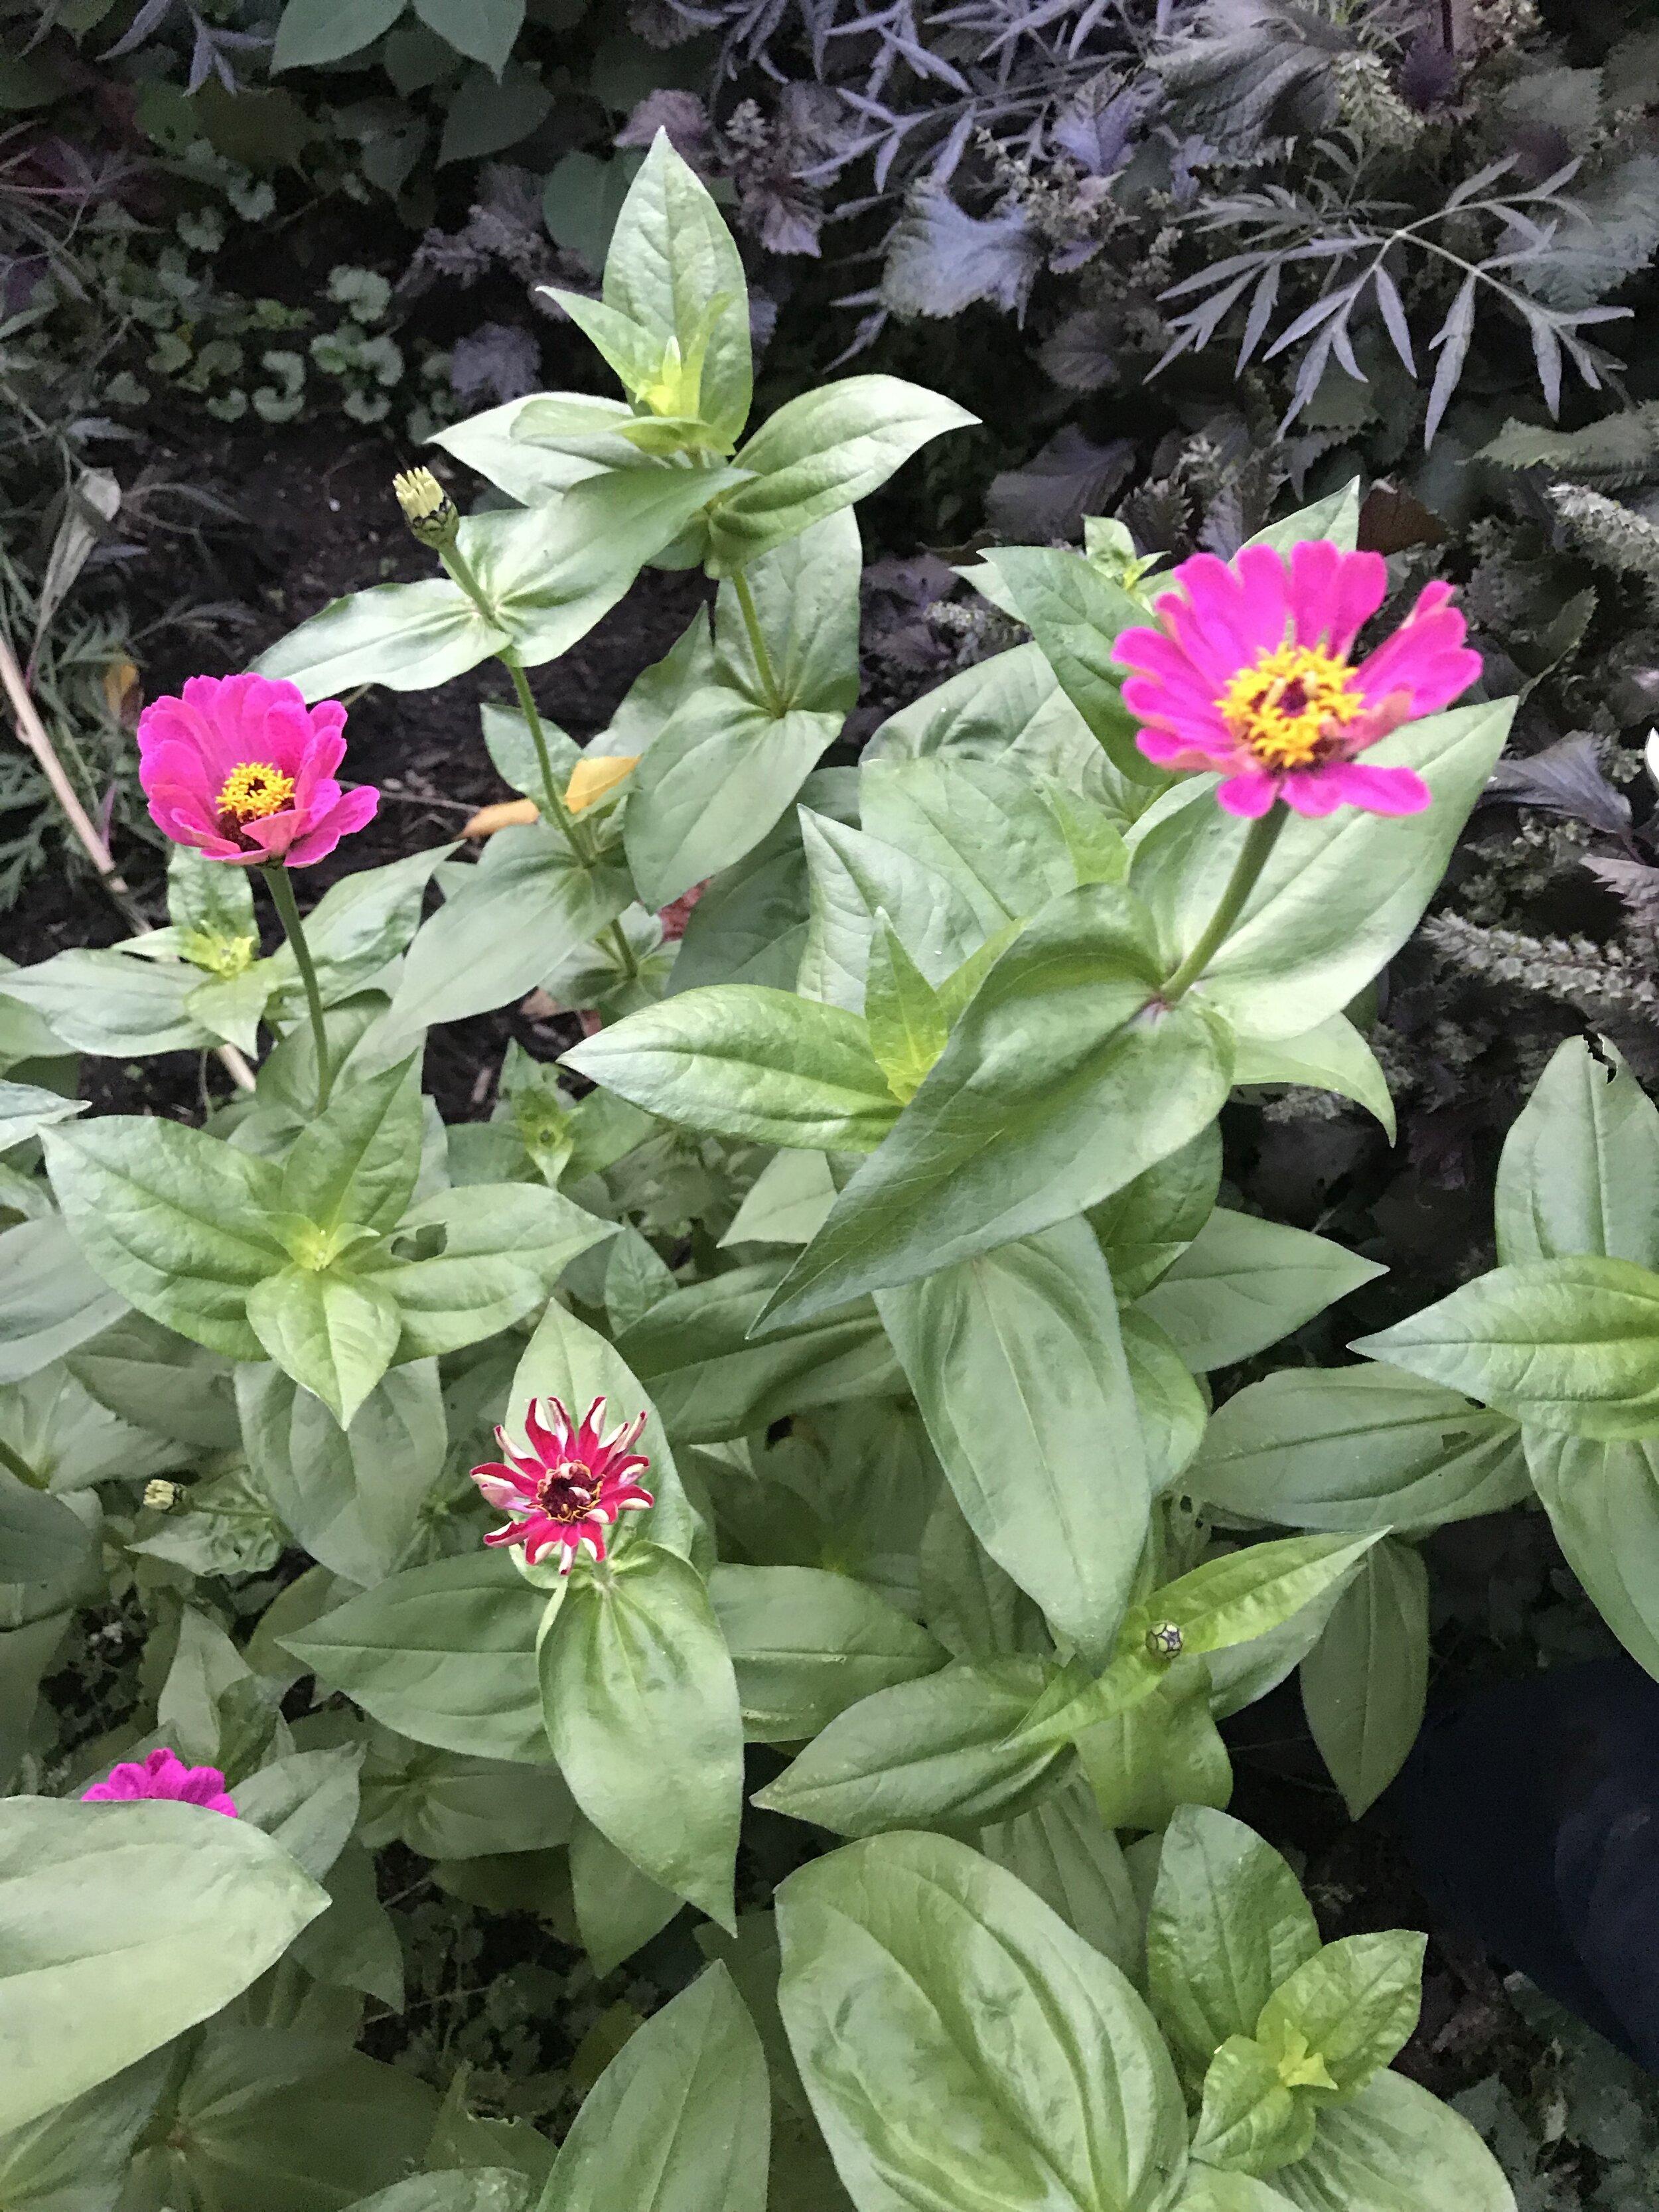 brooklyn_plant_studio_garden_44.jpg